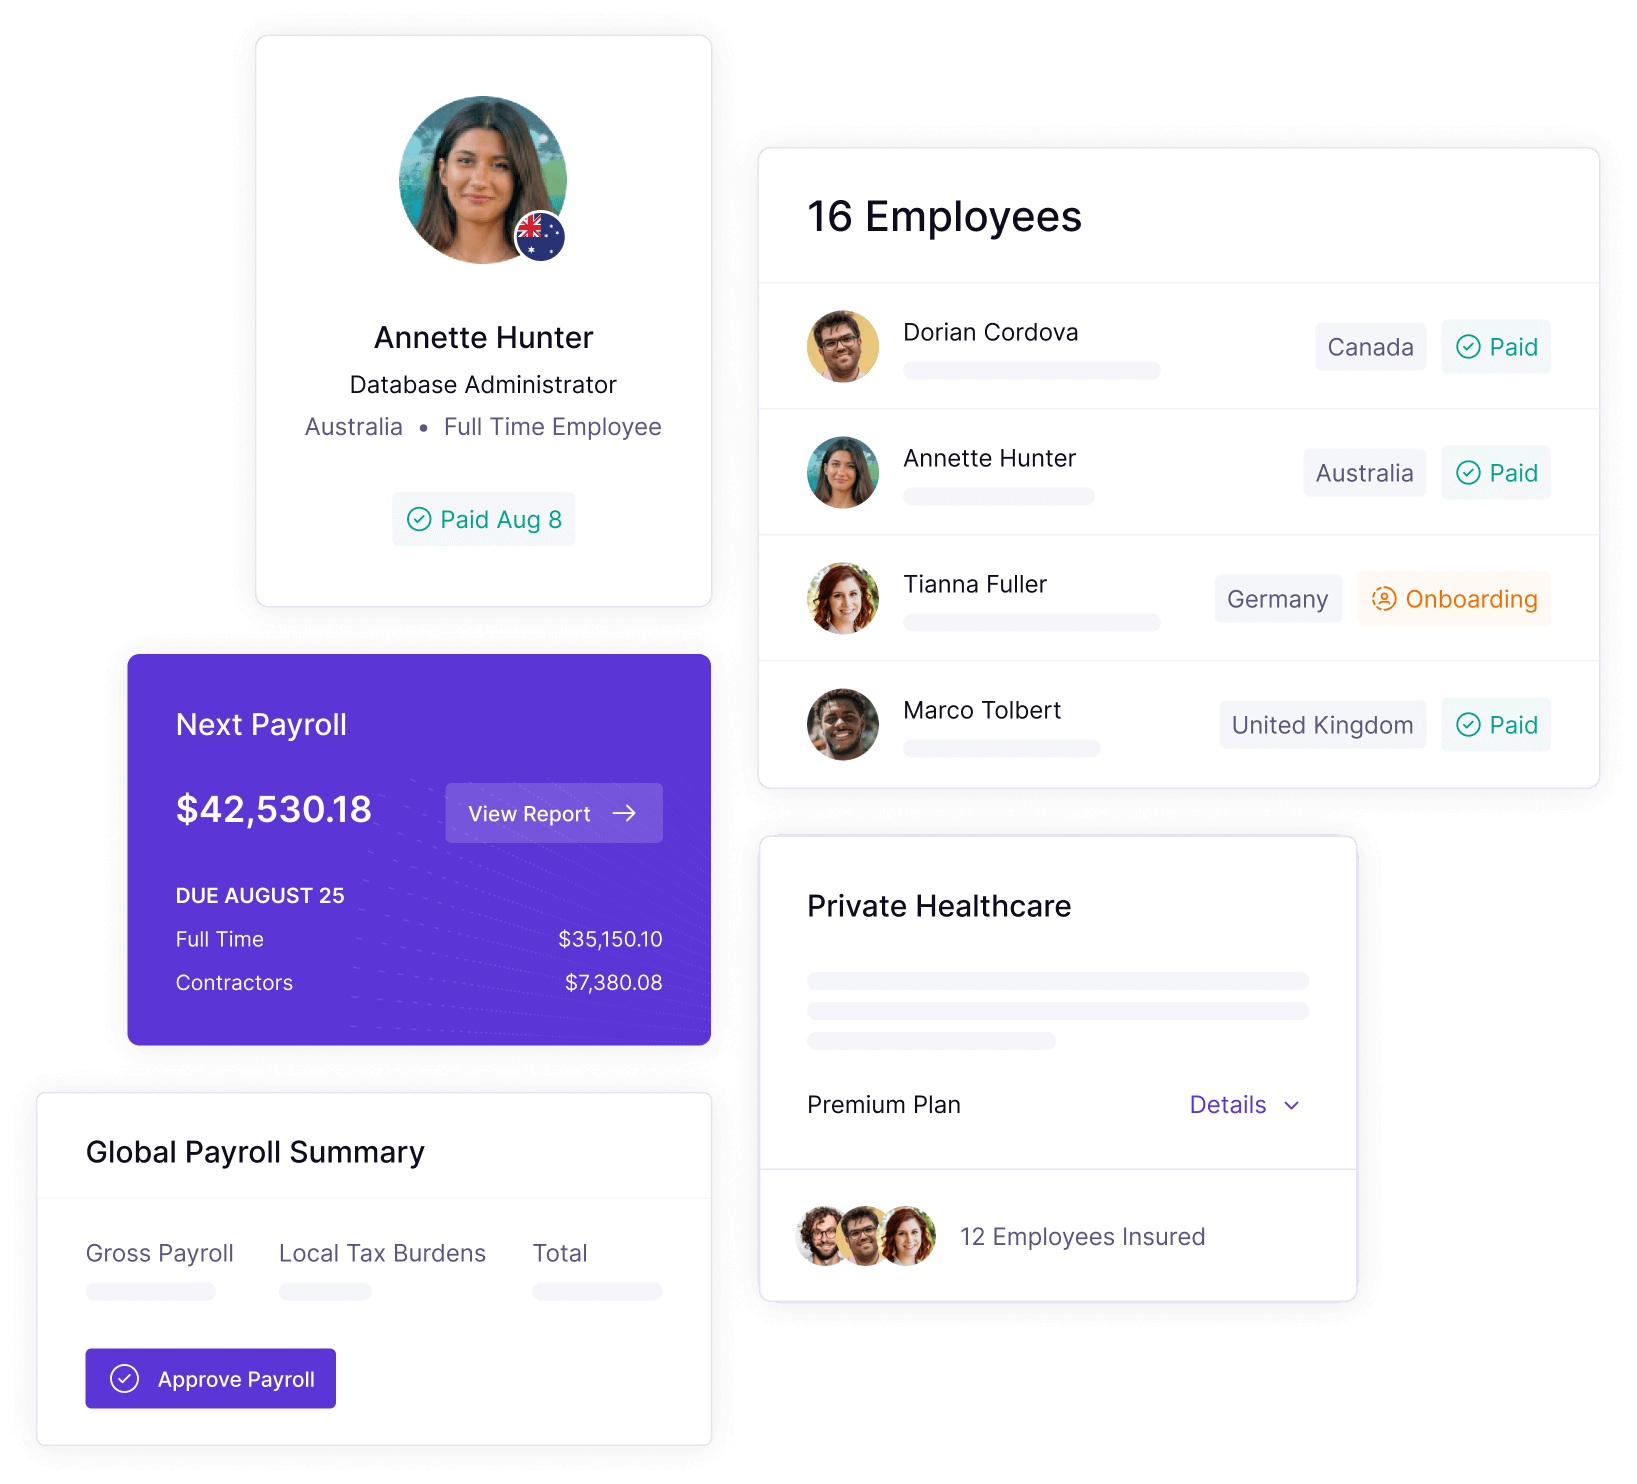 Panther's global employment platform screens